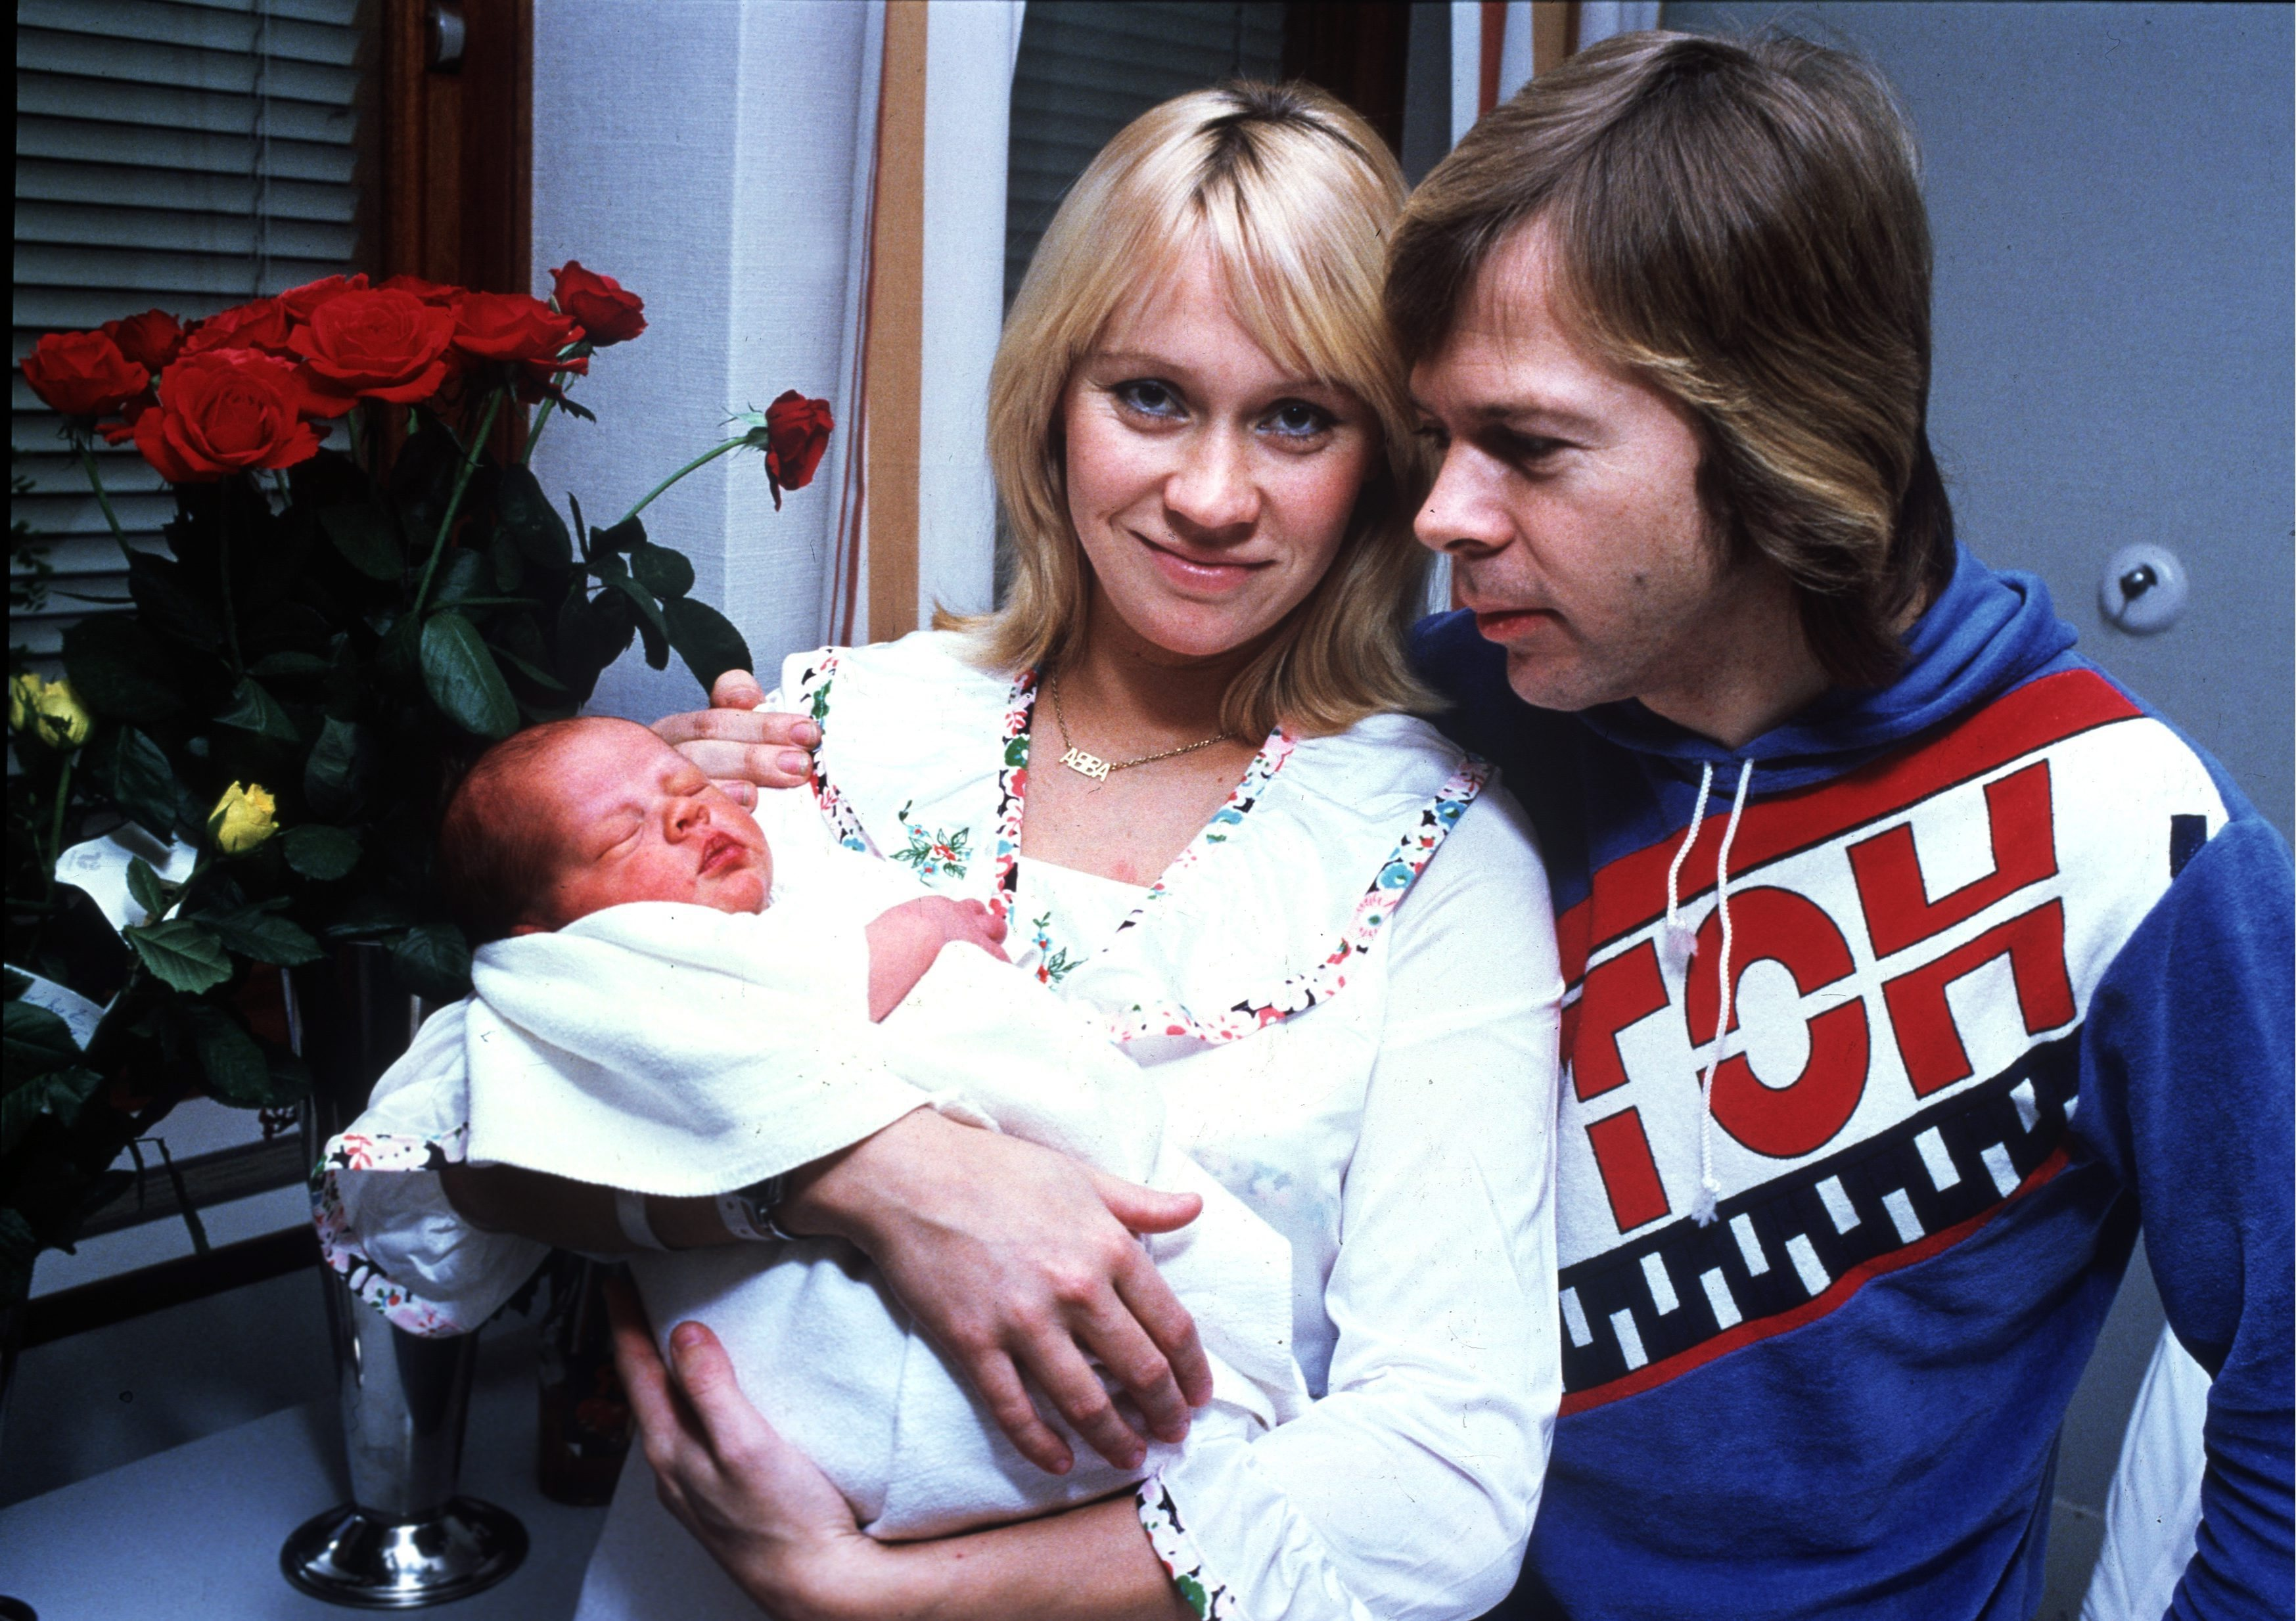 Agnetha and Bjorn